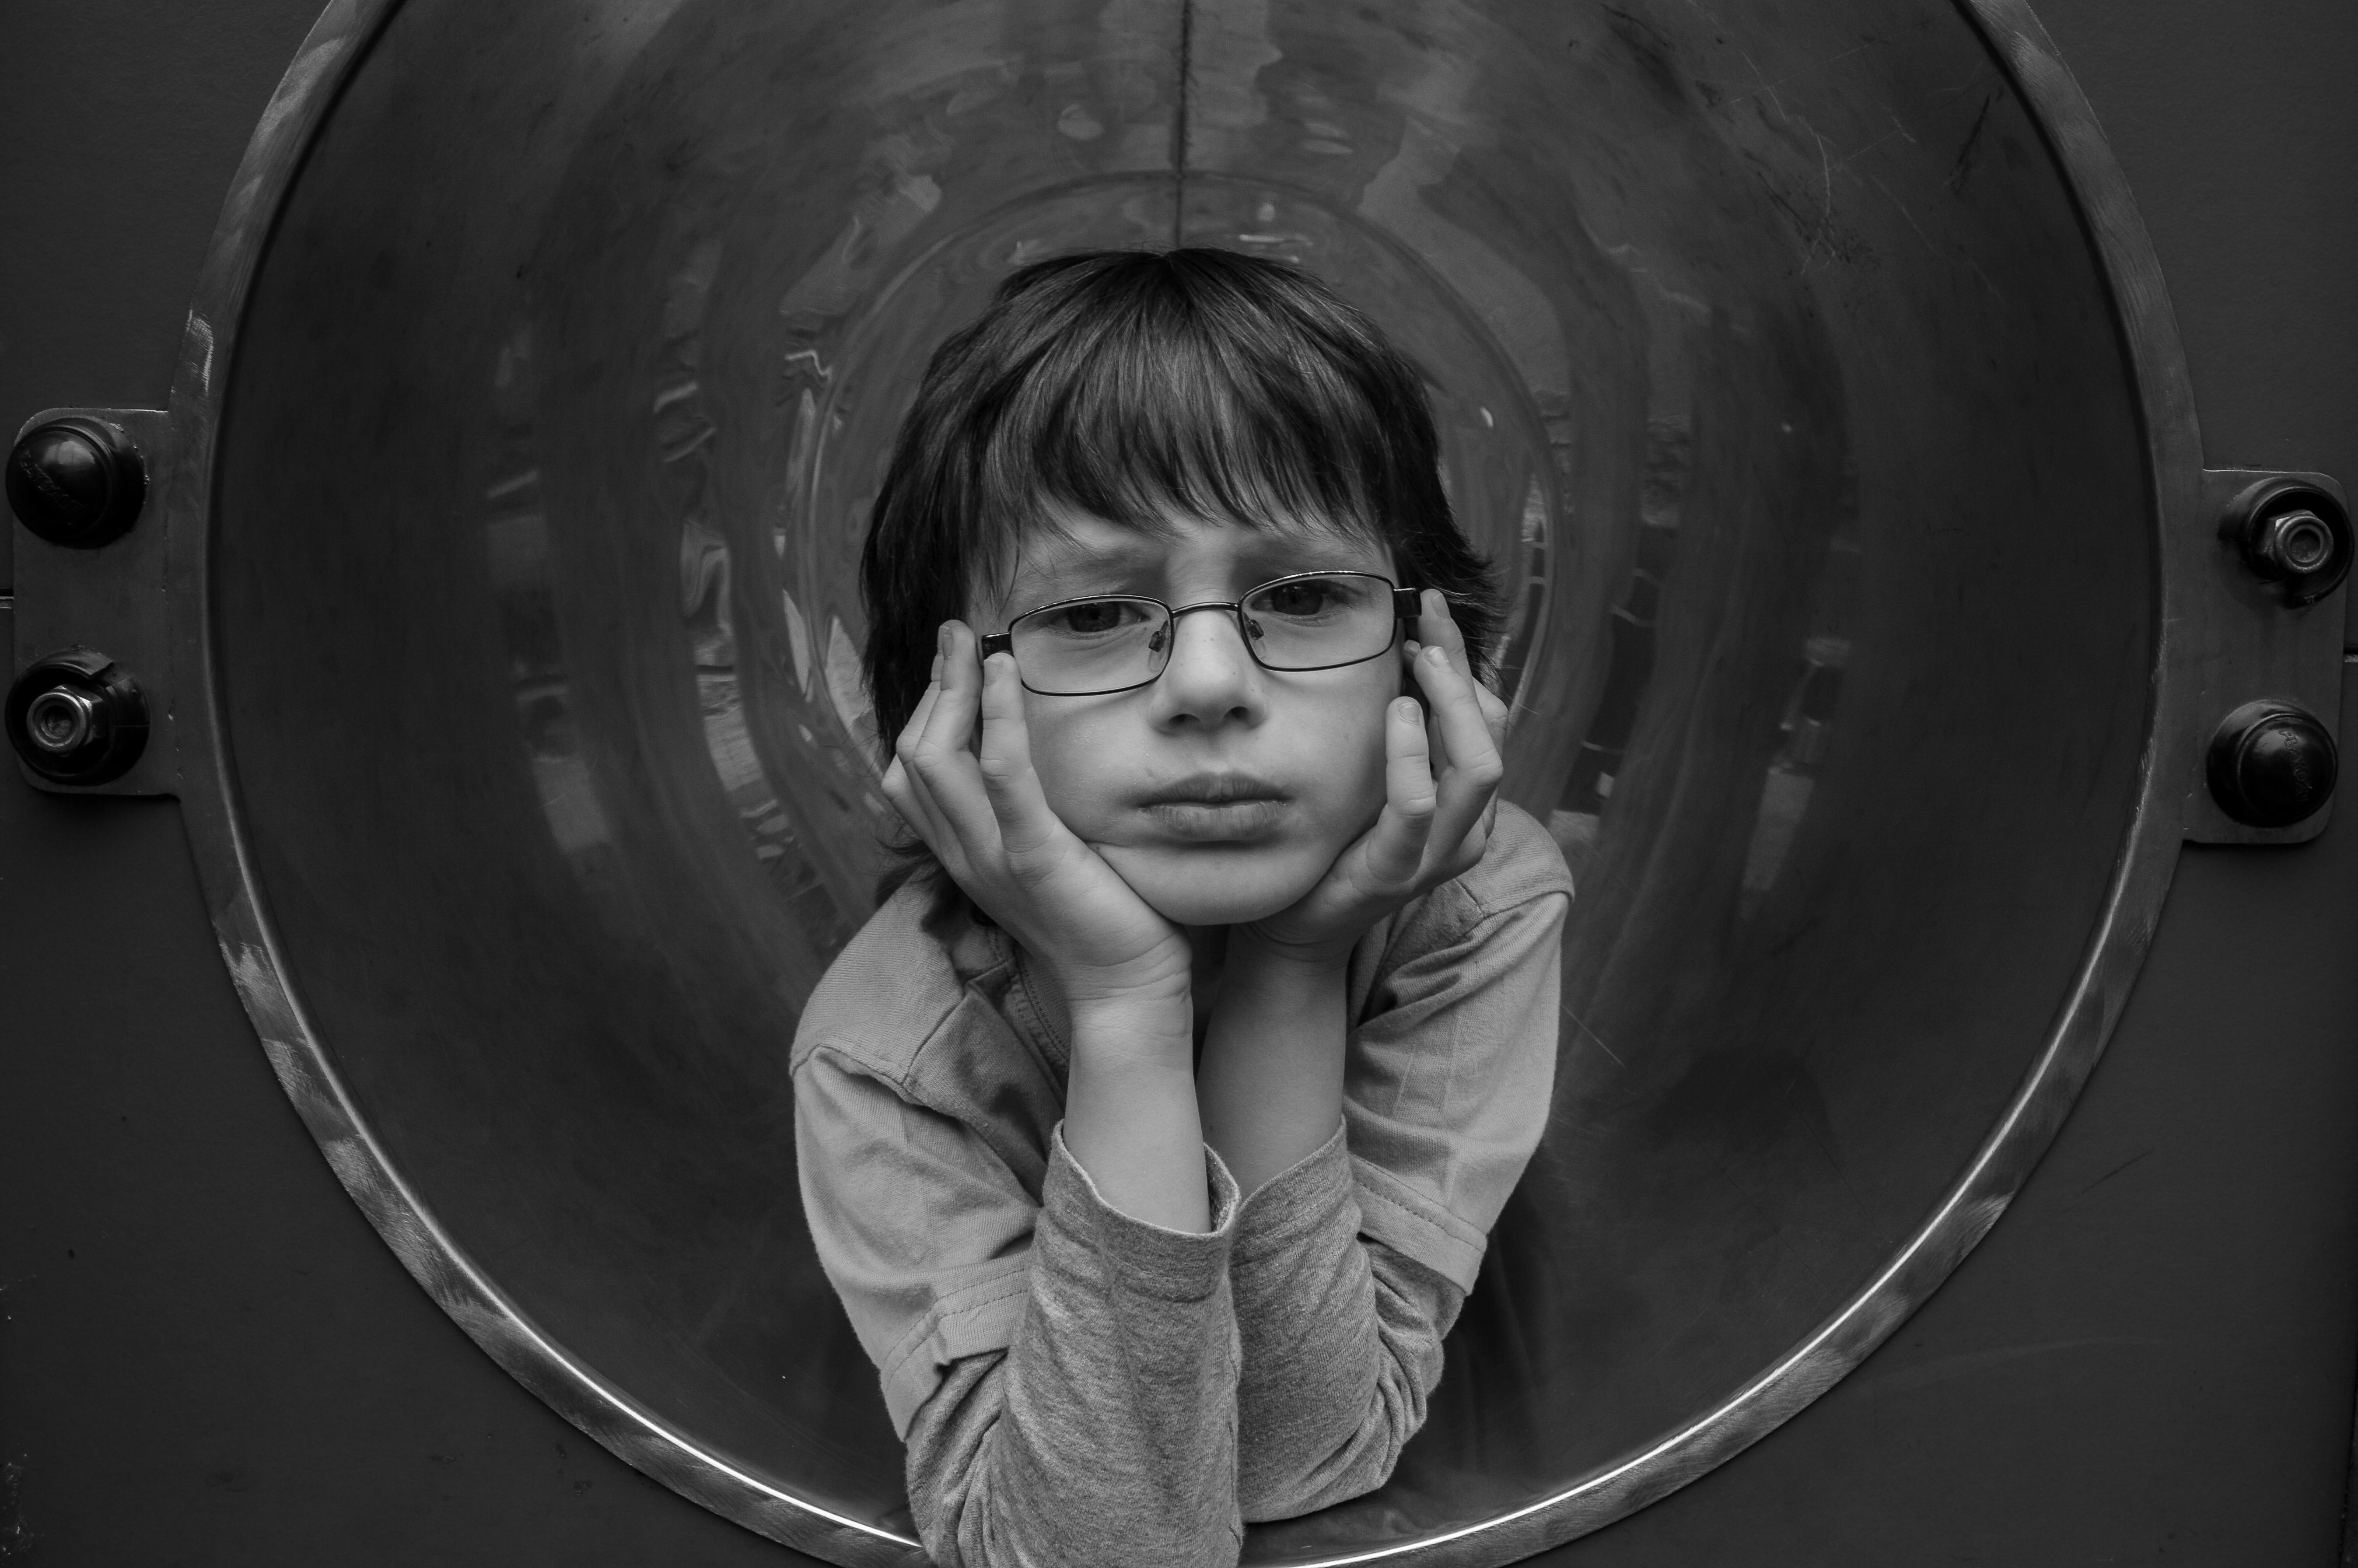 Boy in a Tube